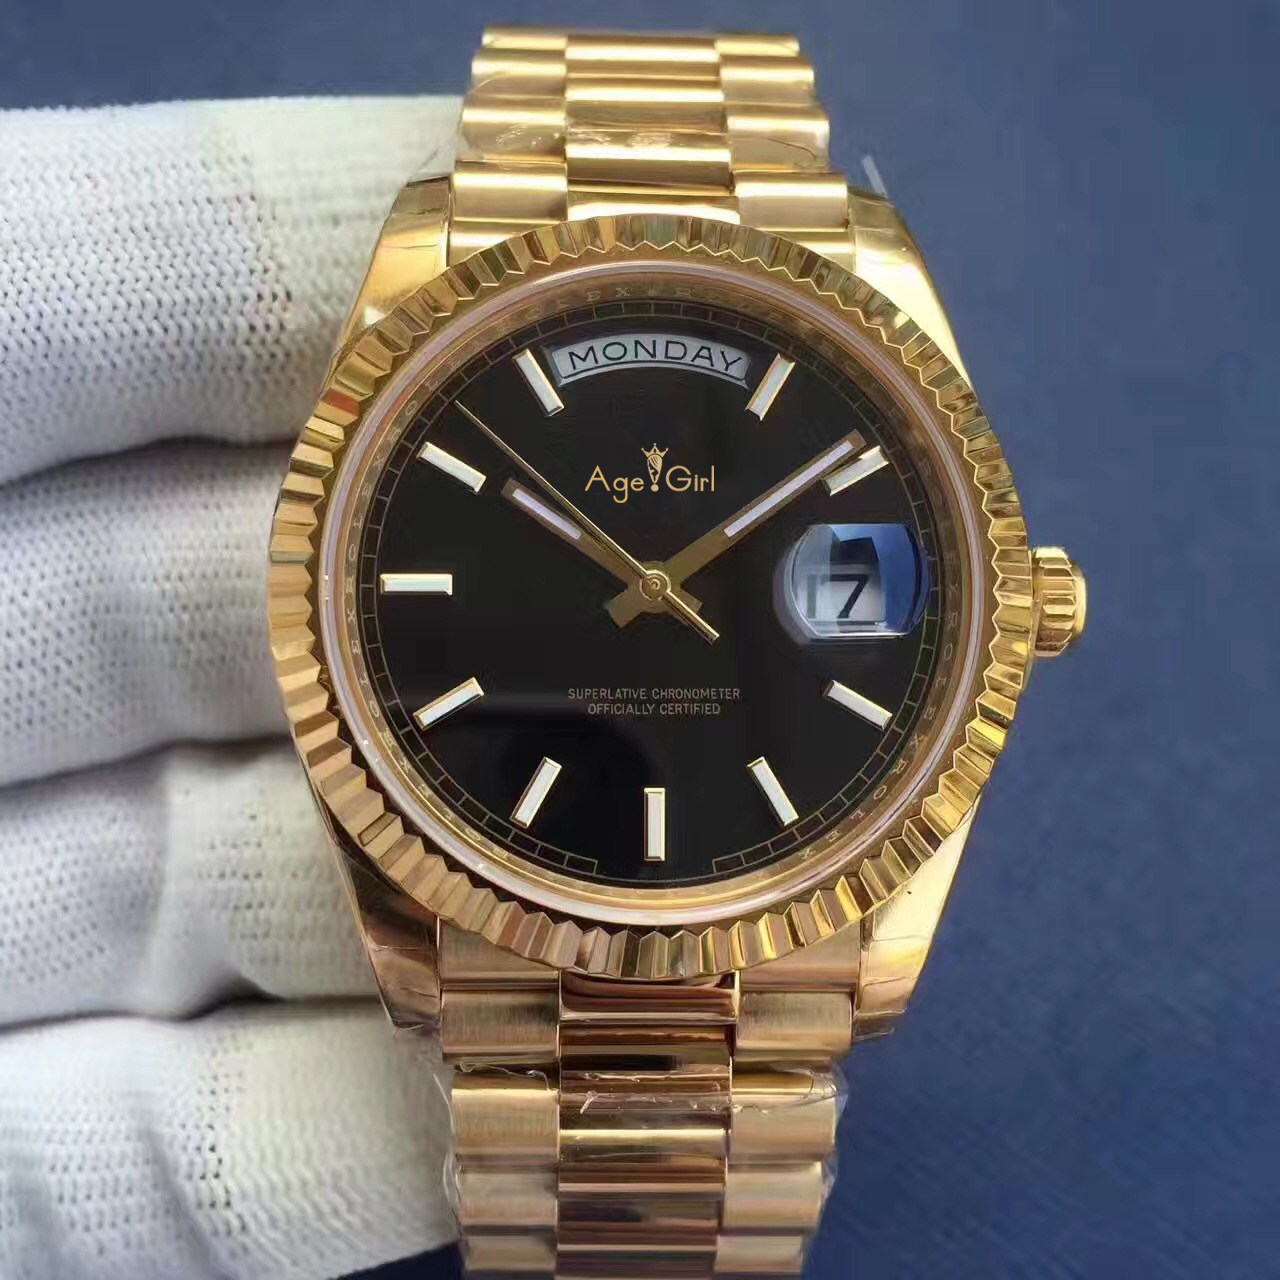 Здесь можно купить  Luxury Brand New Men Daydate Gold Silver Black Green Watch Automatic Mechanical Stainless Steel Sapphire Day-date Watches 41mm  Часы